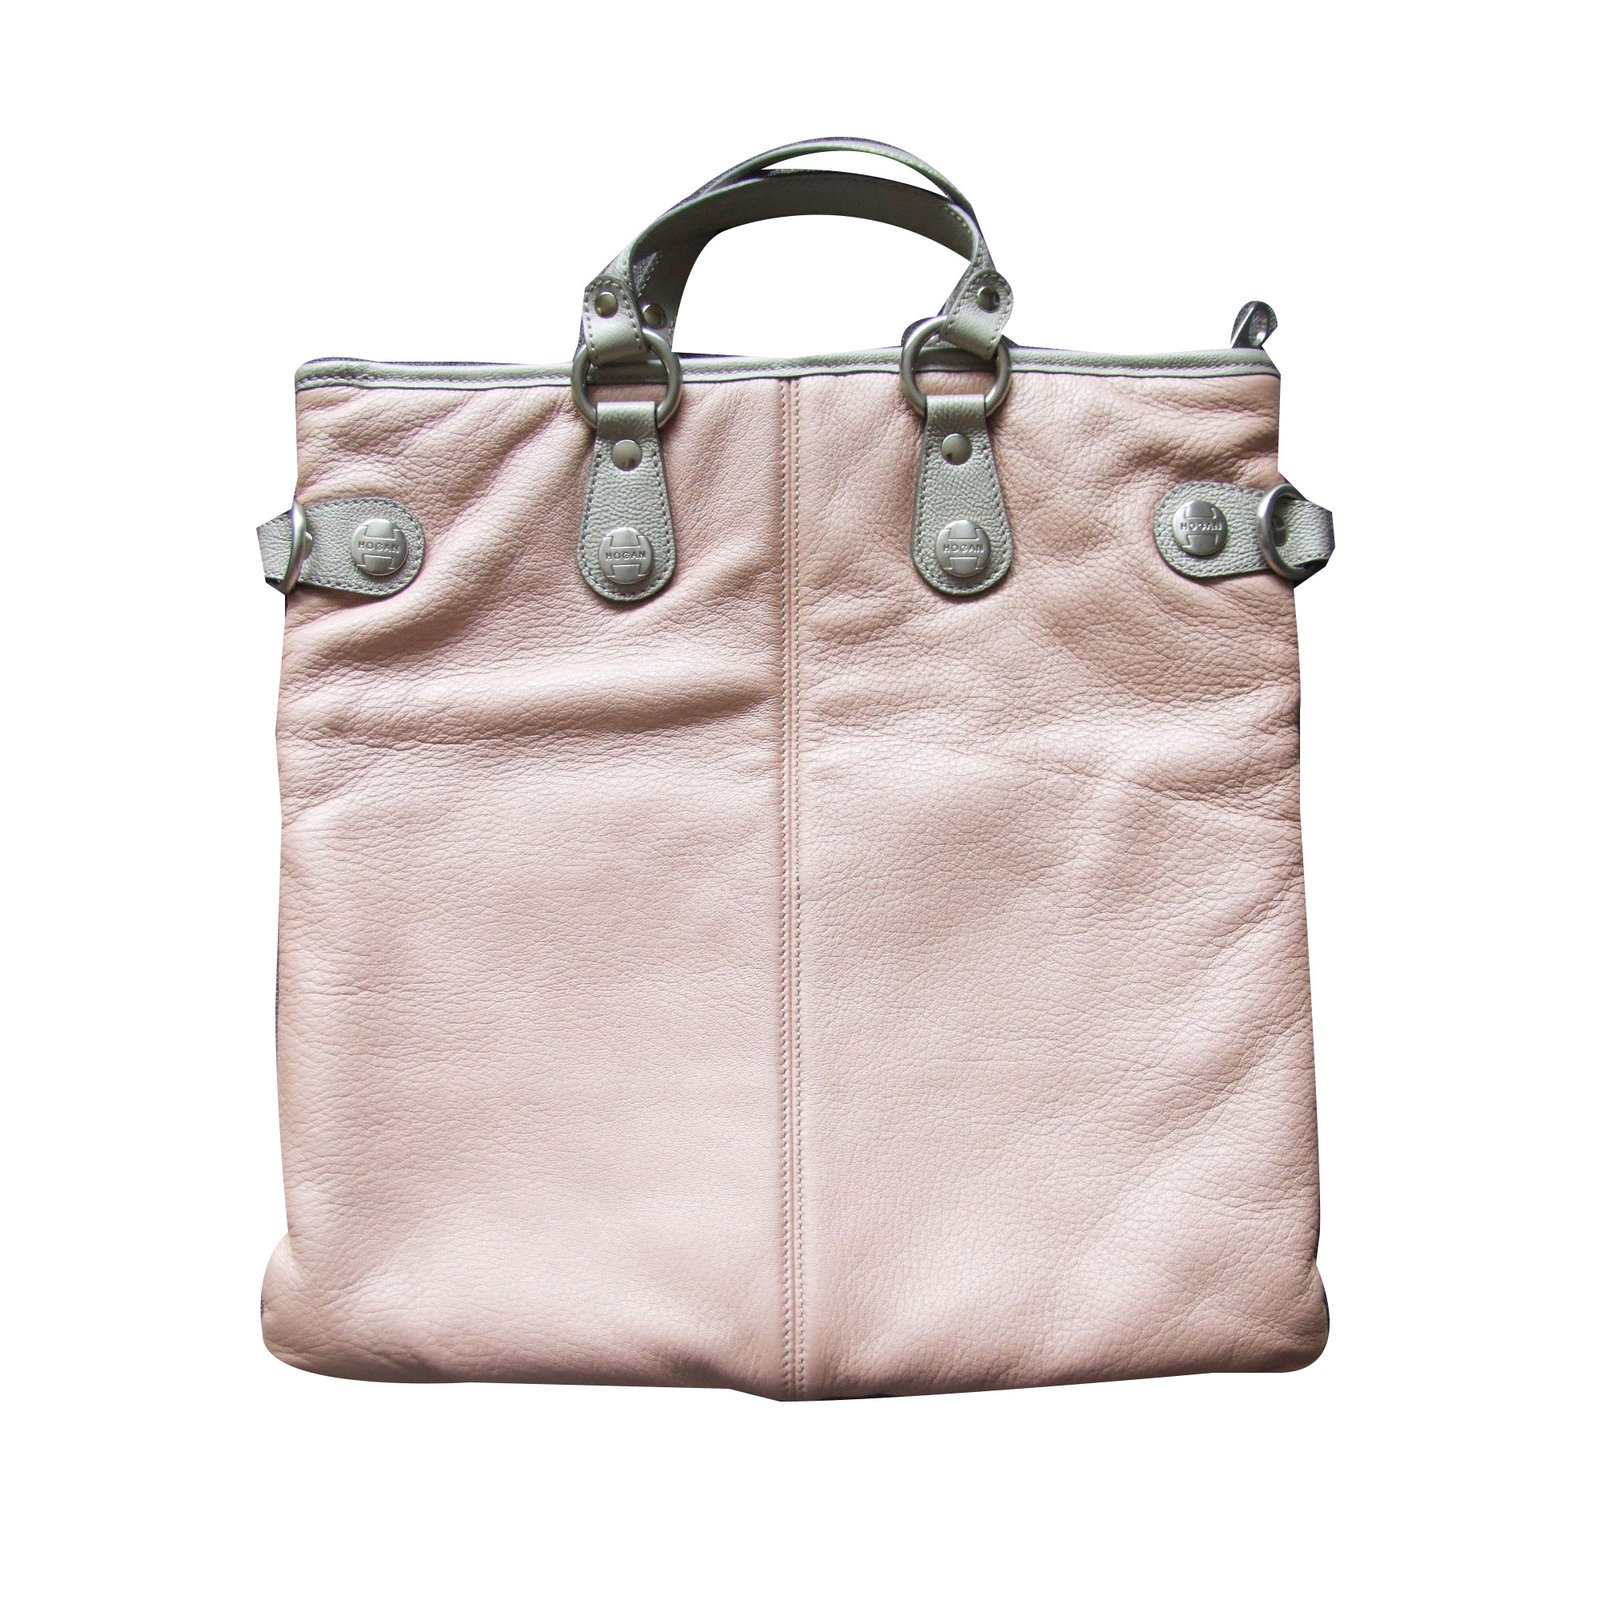 b3dbc40030 Hogan Hogan  Trend Media  bag Handbags Leather Silvery